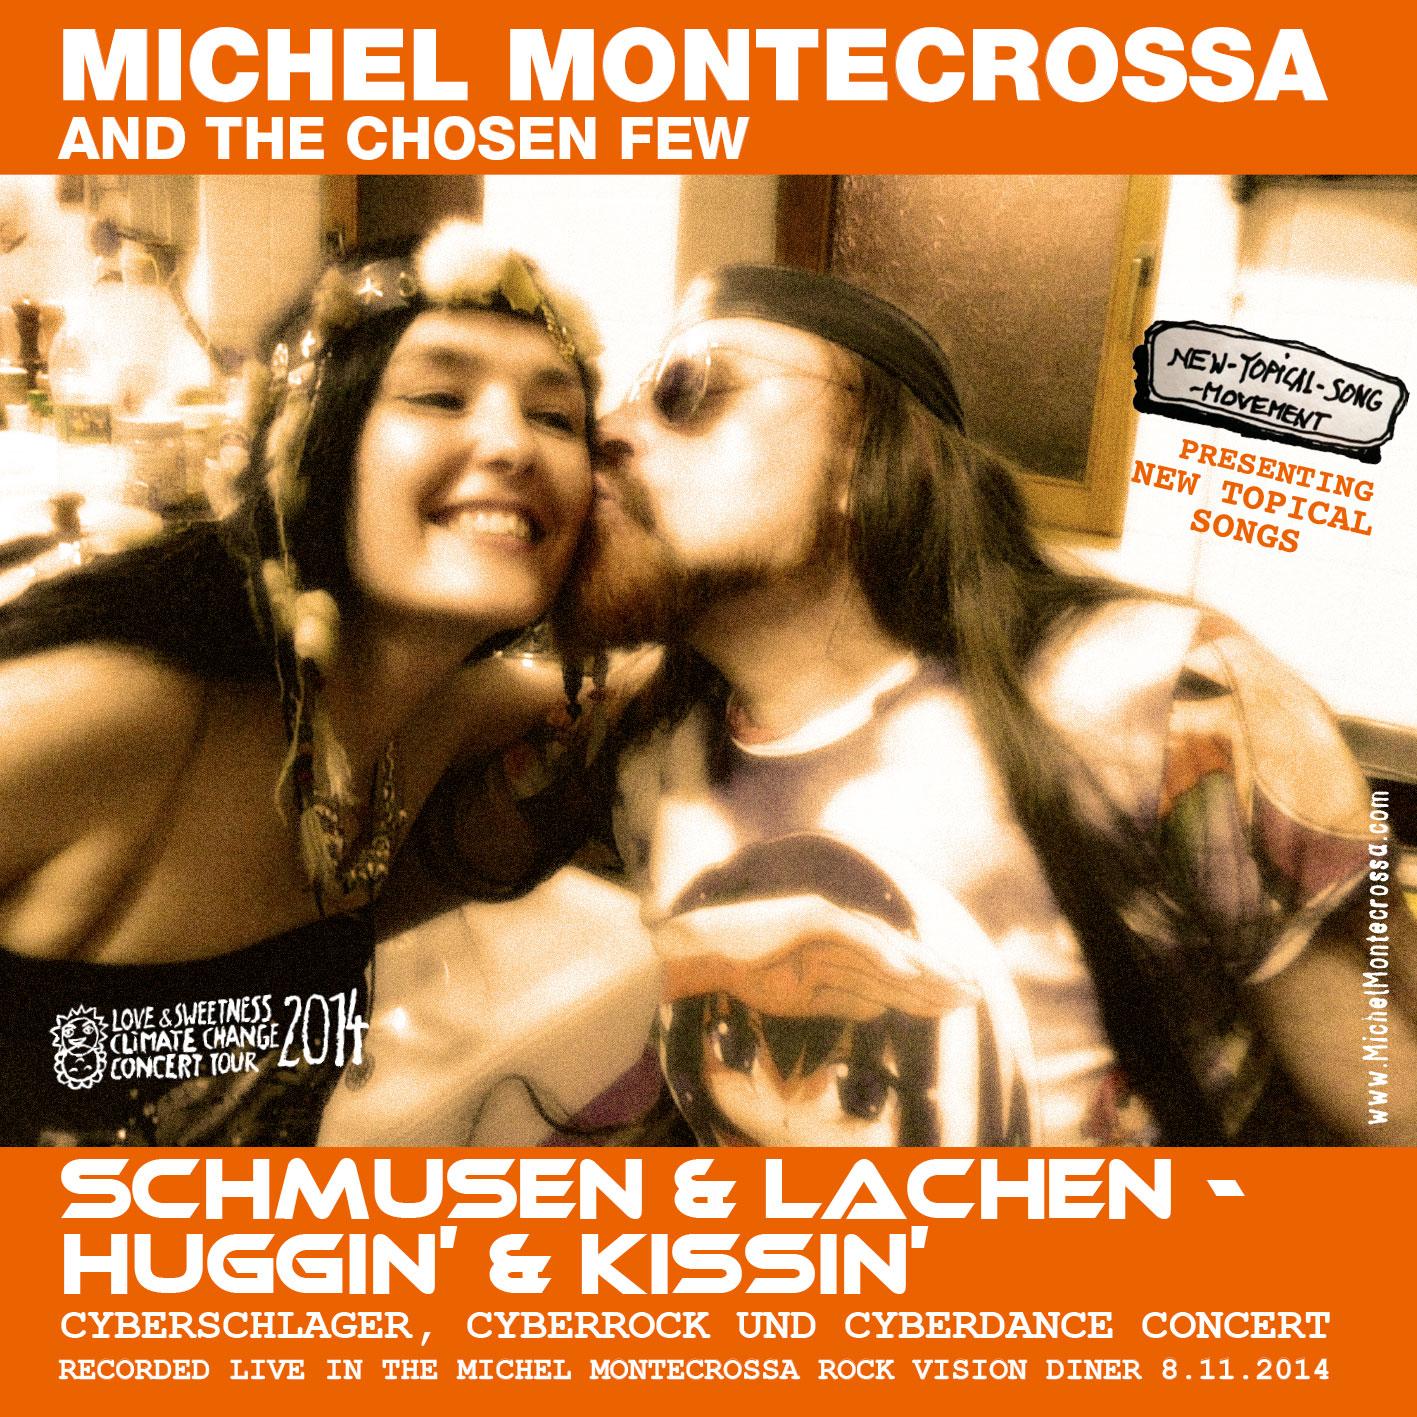 Schmusen & Lachen - Huggin' & Kissin' Concert